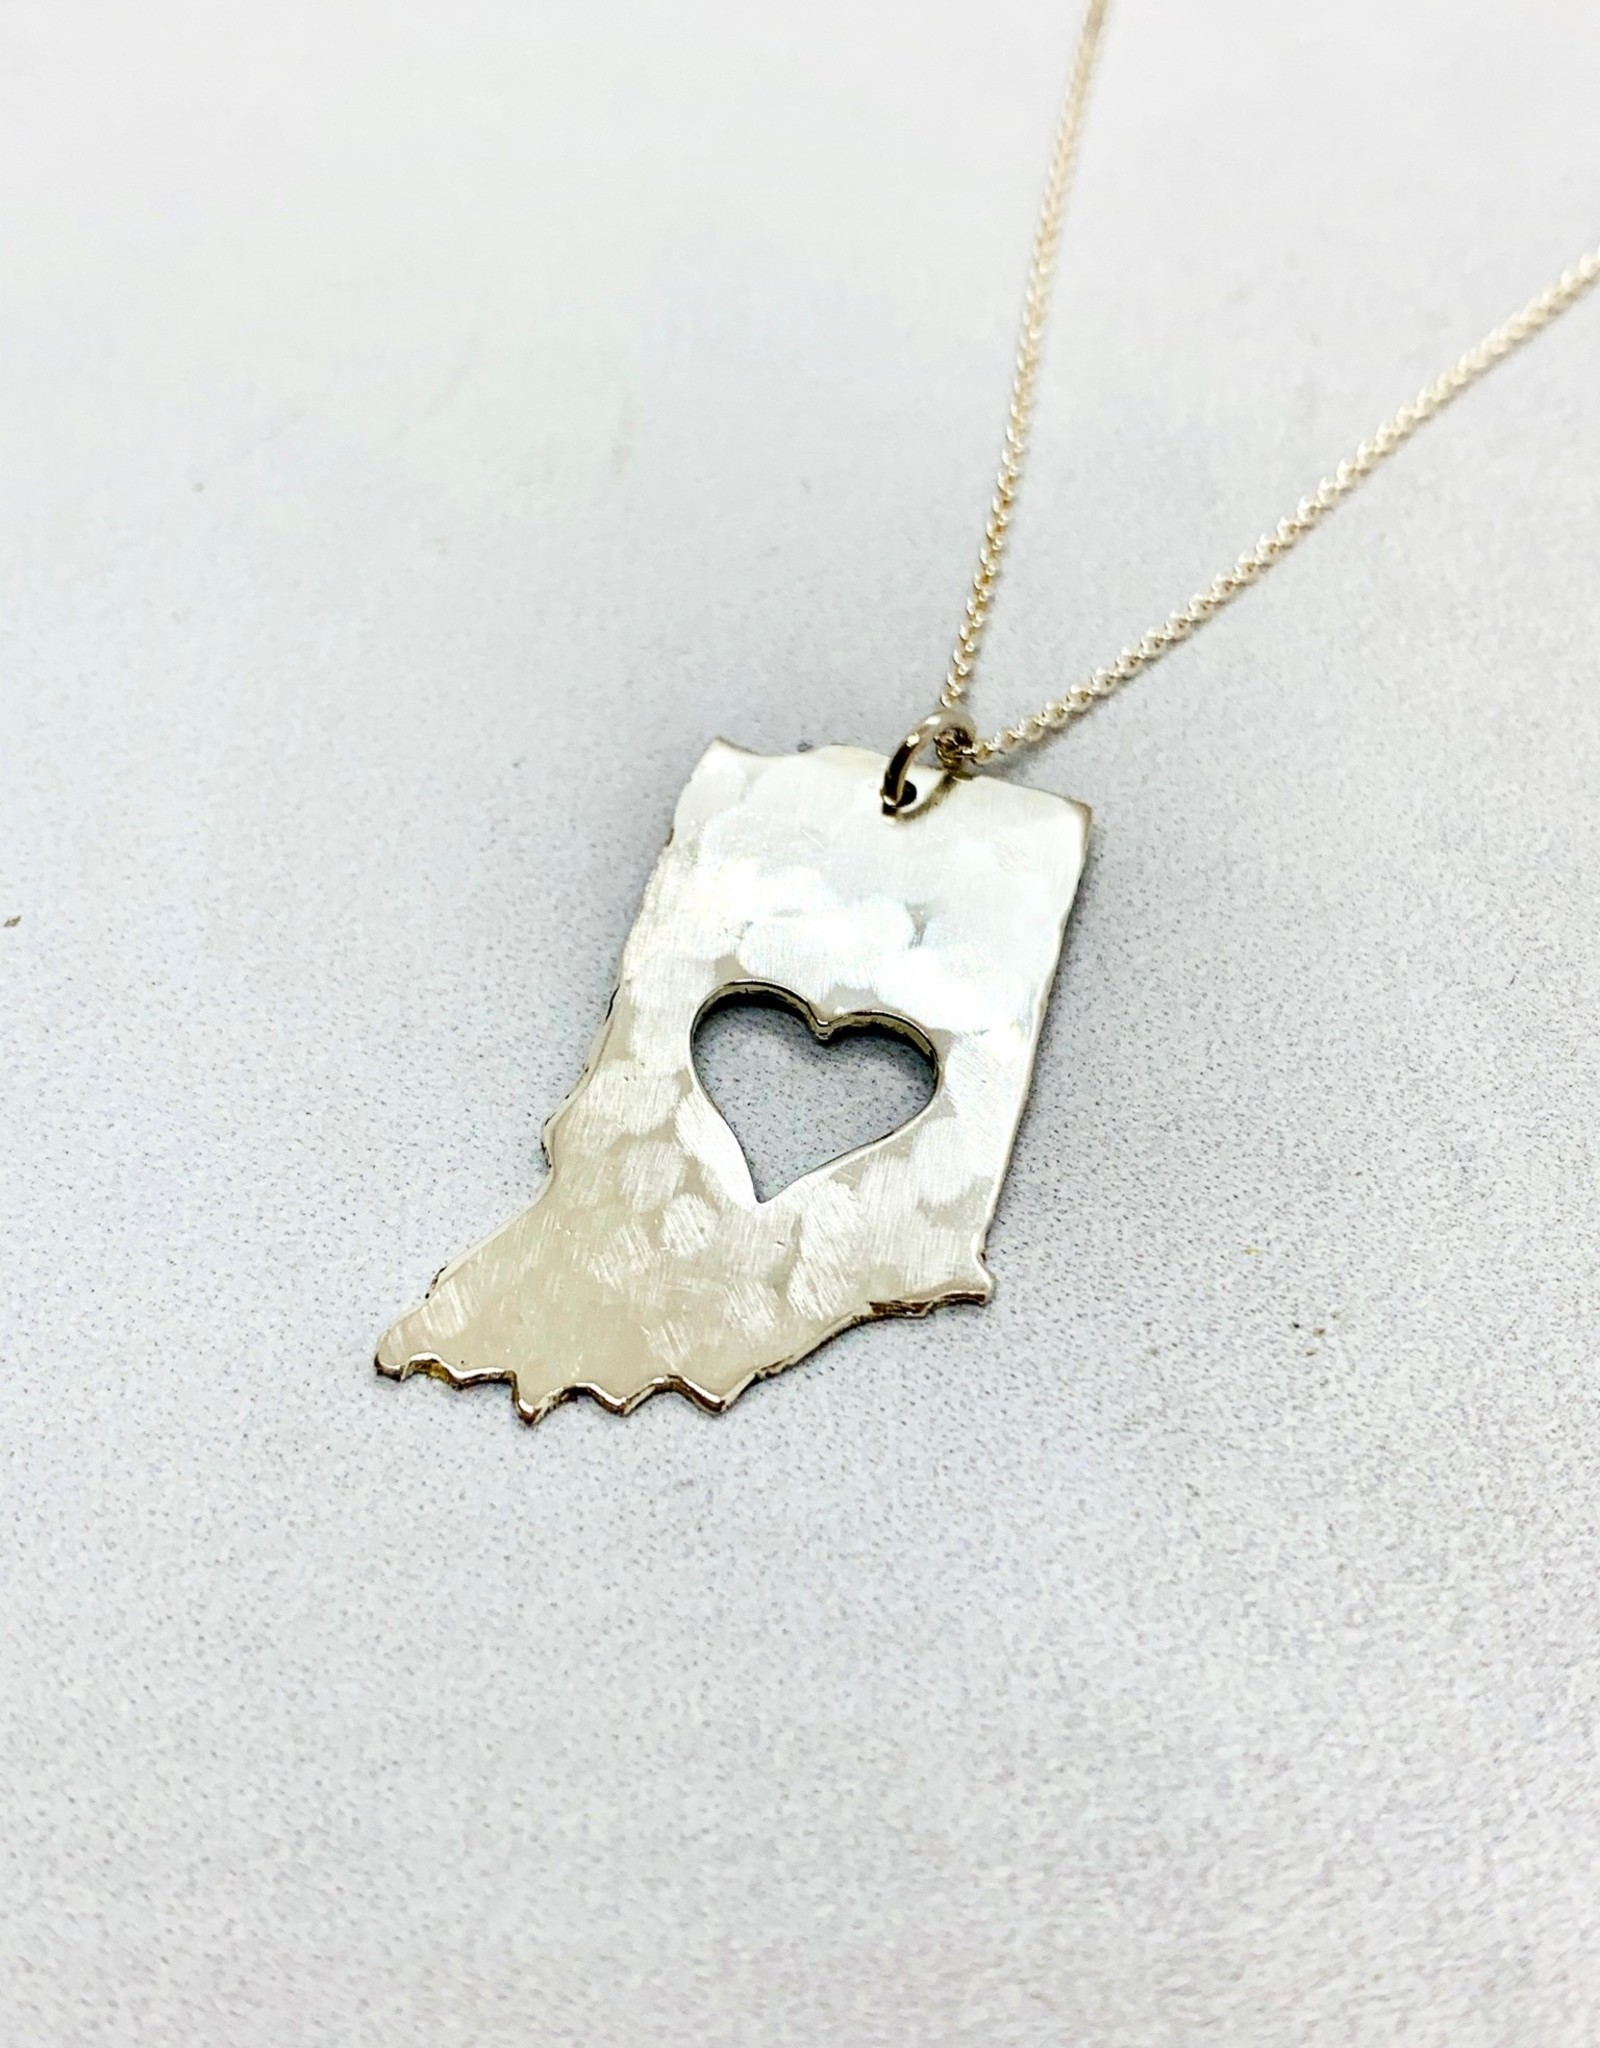 saraleathers Handstamped Hammered Heart Indiana Necklace 2